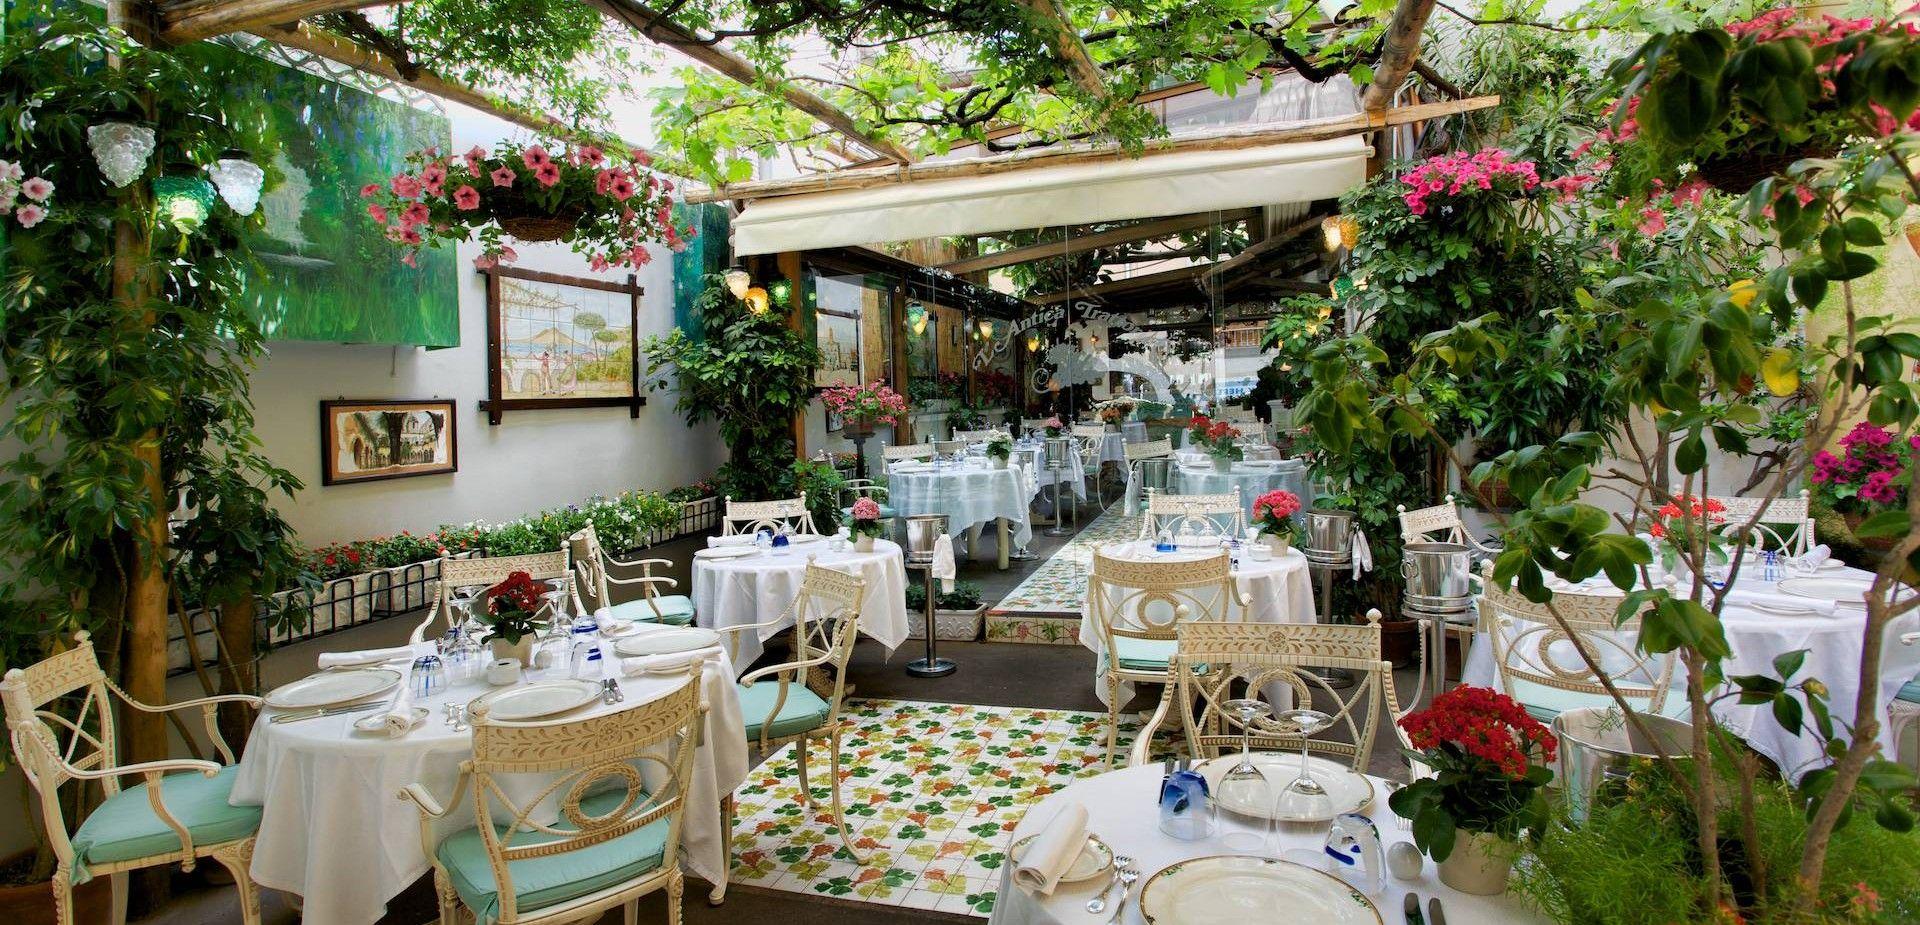 L'Antica Tratoria, Sorrento Romantic dinner idea